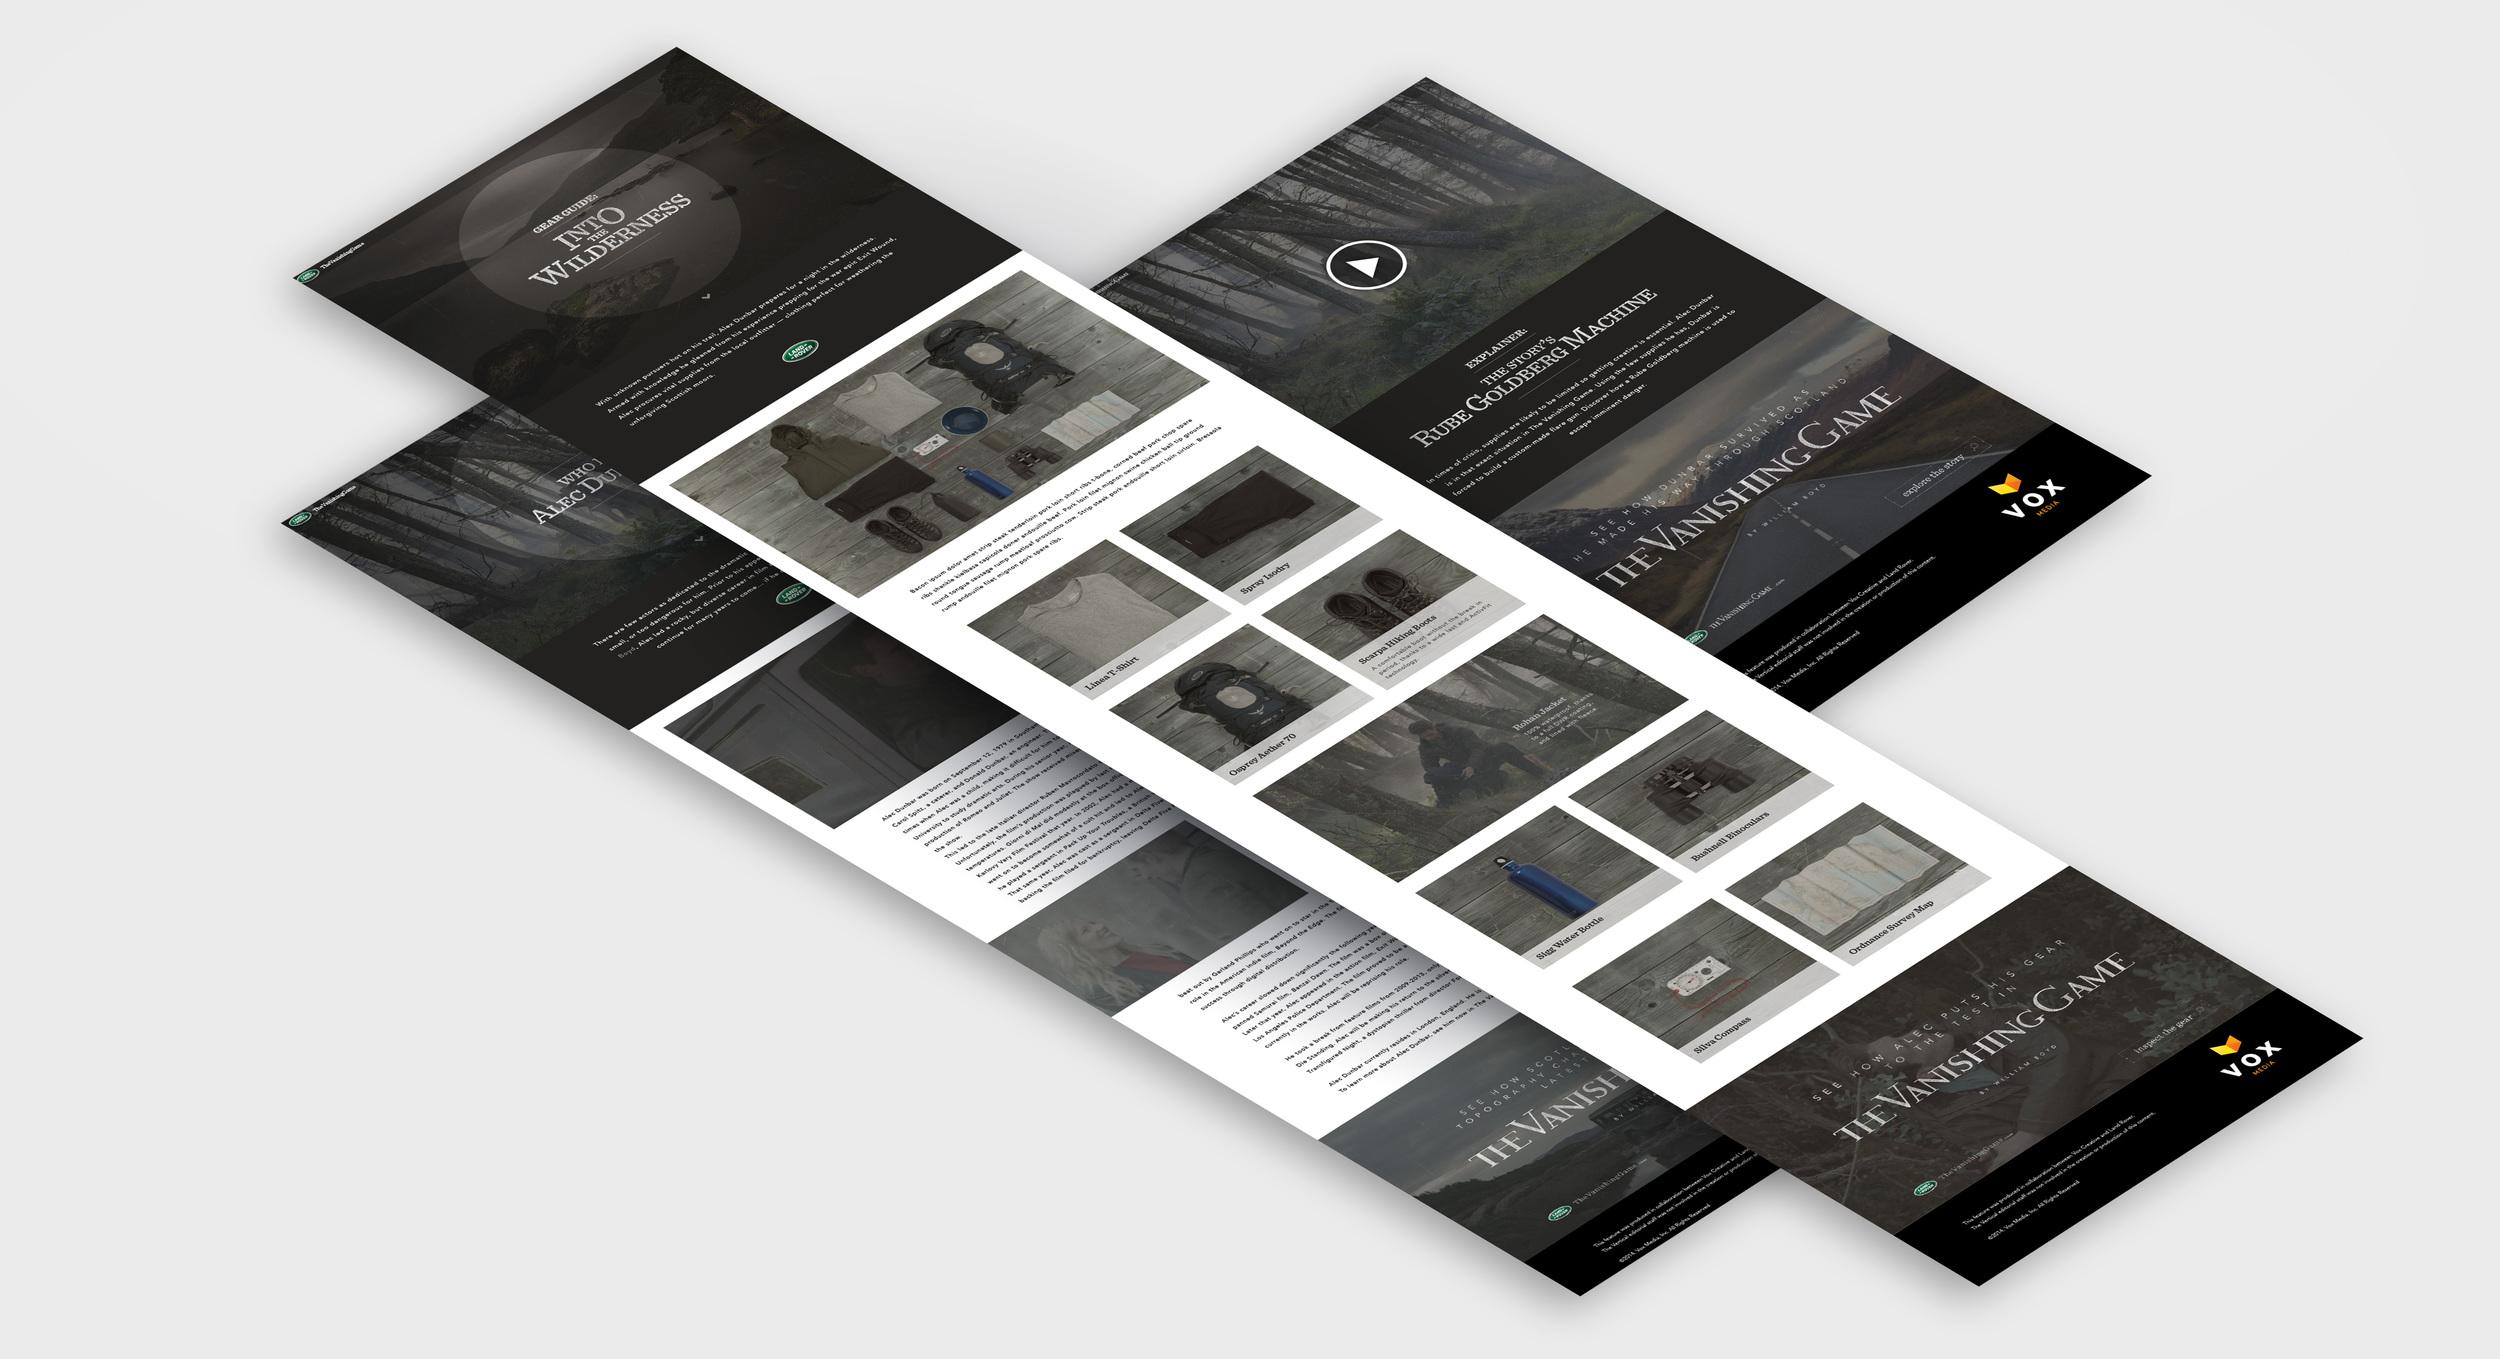 landrover-webpages.jpg